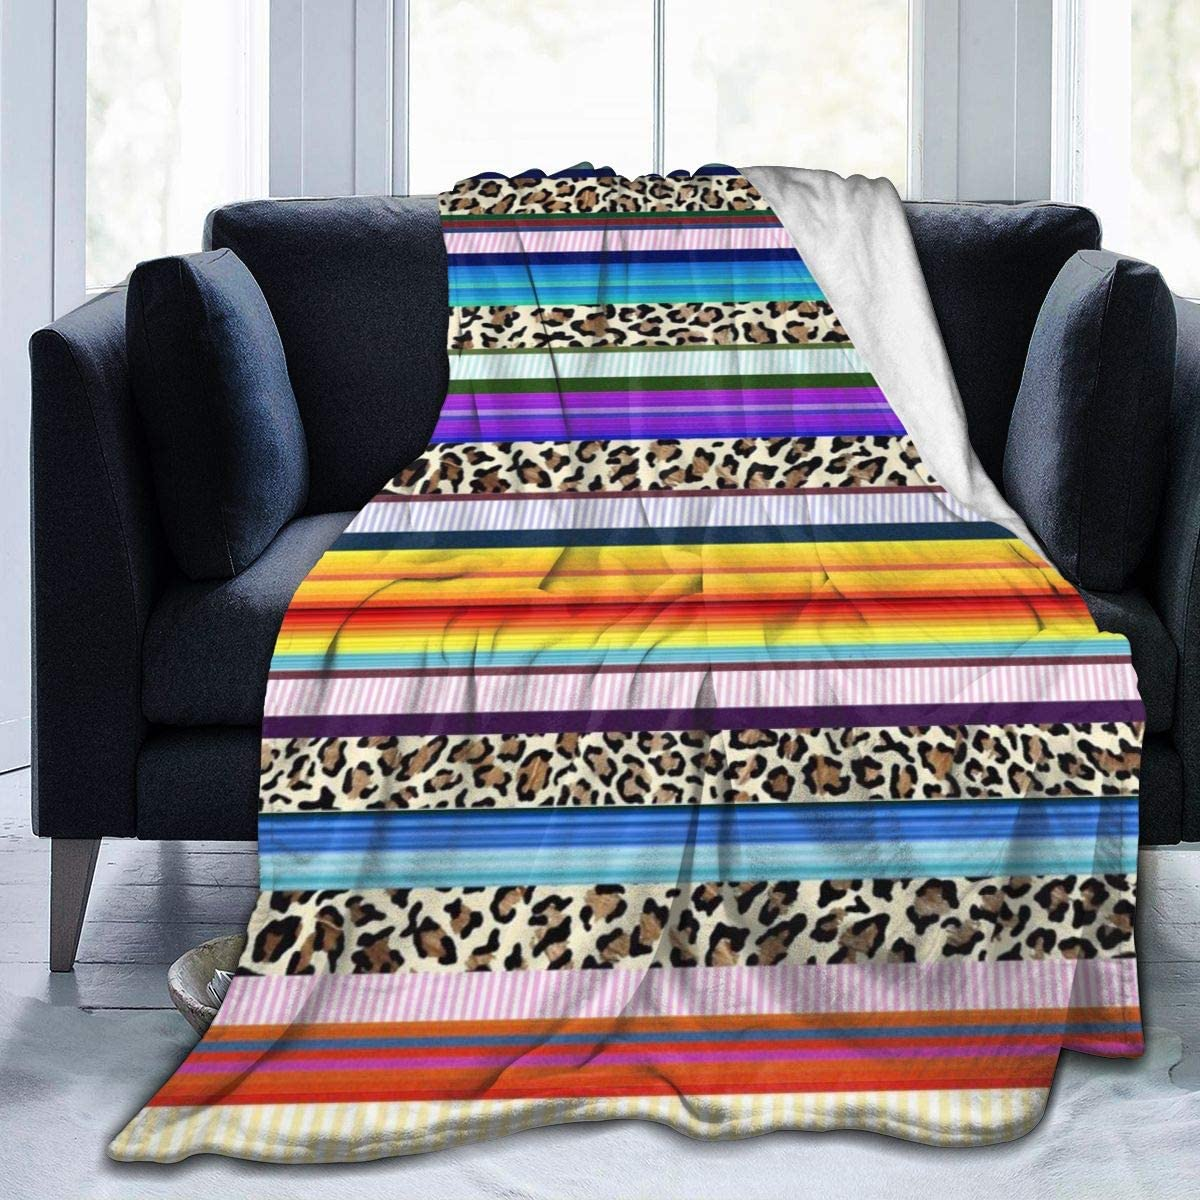 Boston Mall TS HOME ART Blanket Virginia Beach Mall Mexican Serapes Bl Soft Leopard Print Fleece